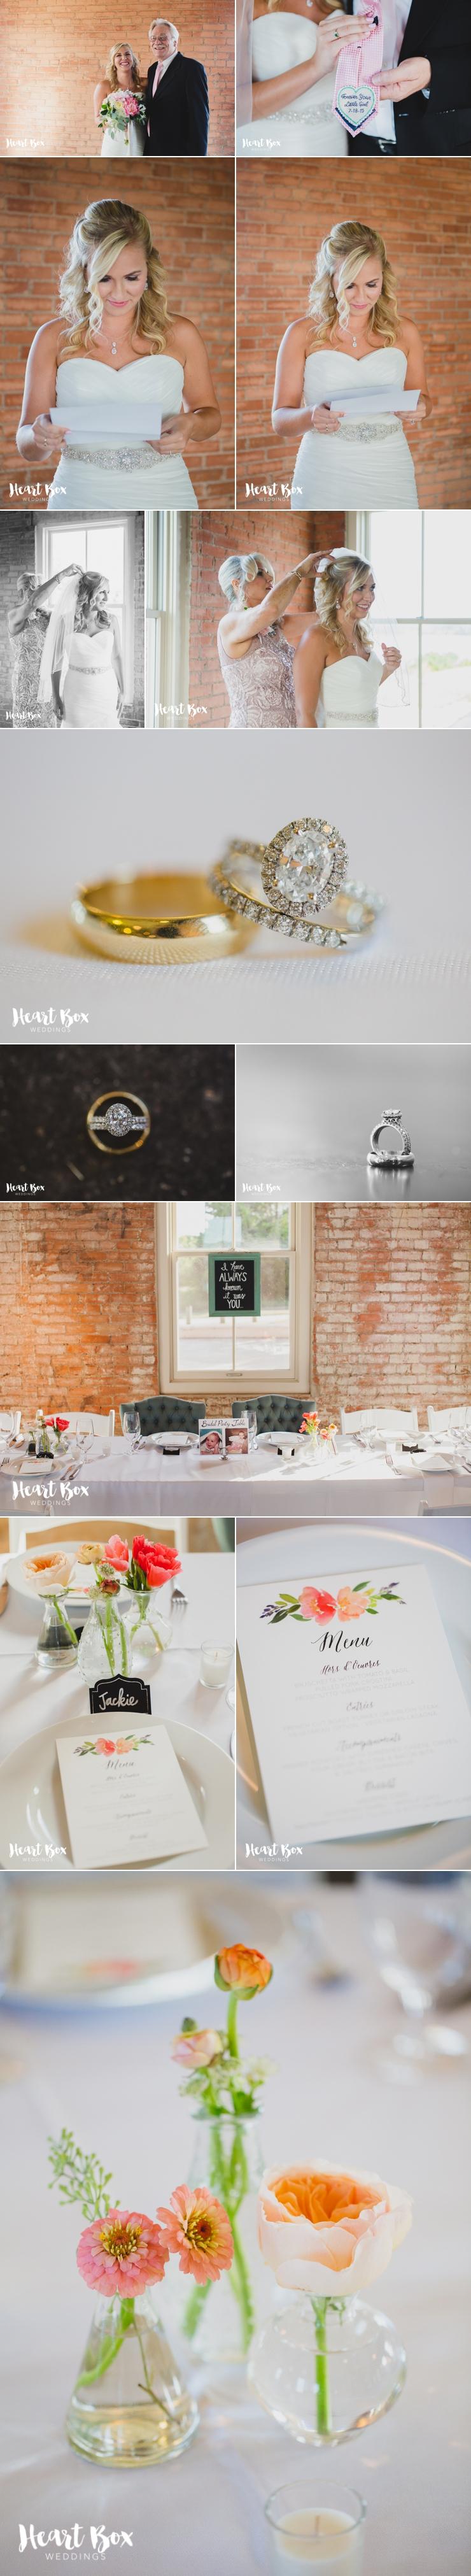 Gould Wedding Blog Collages 9.jpg